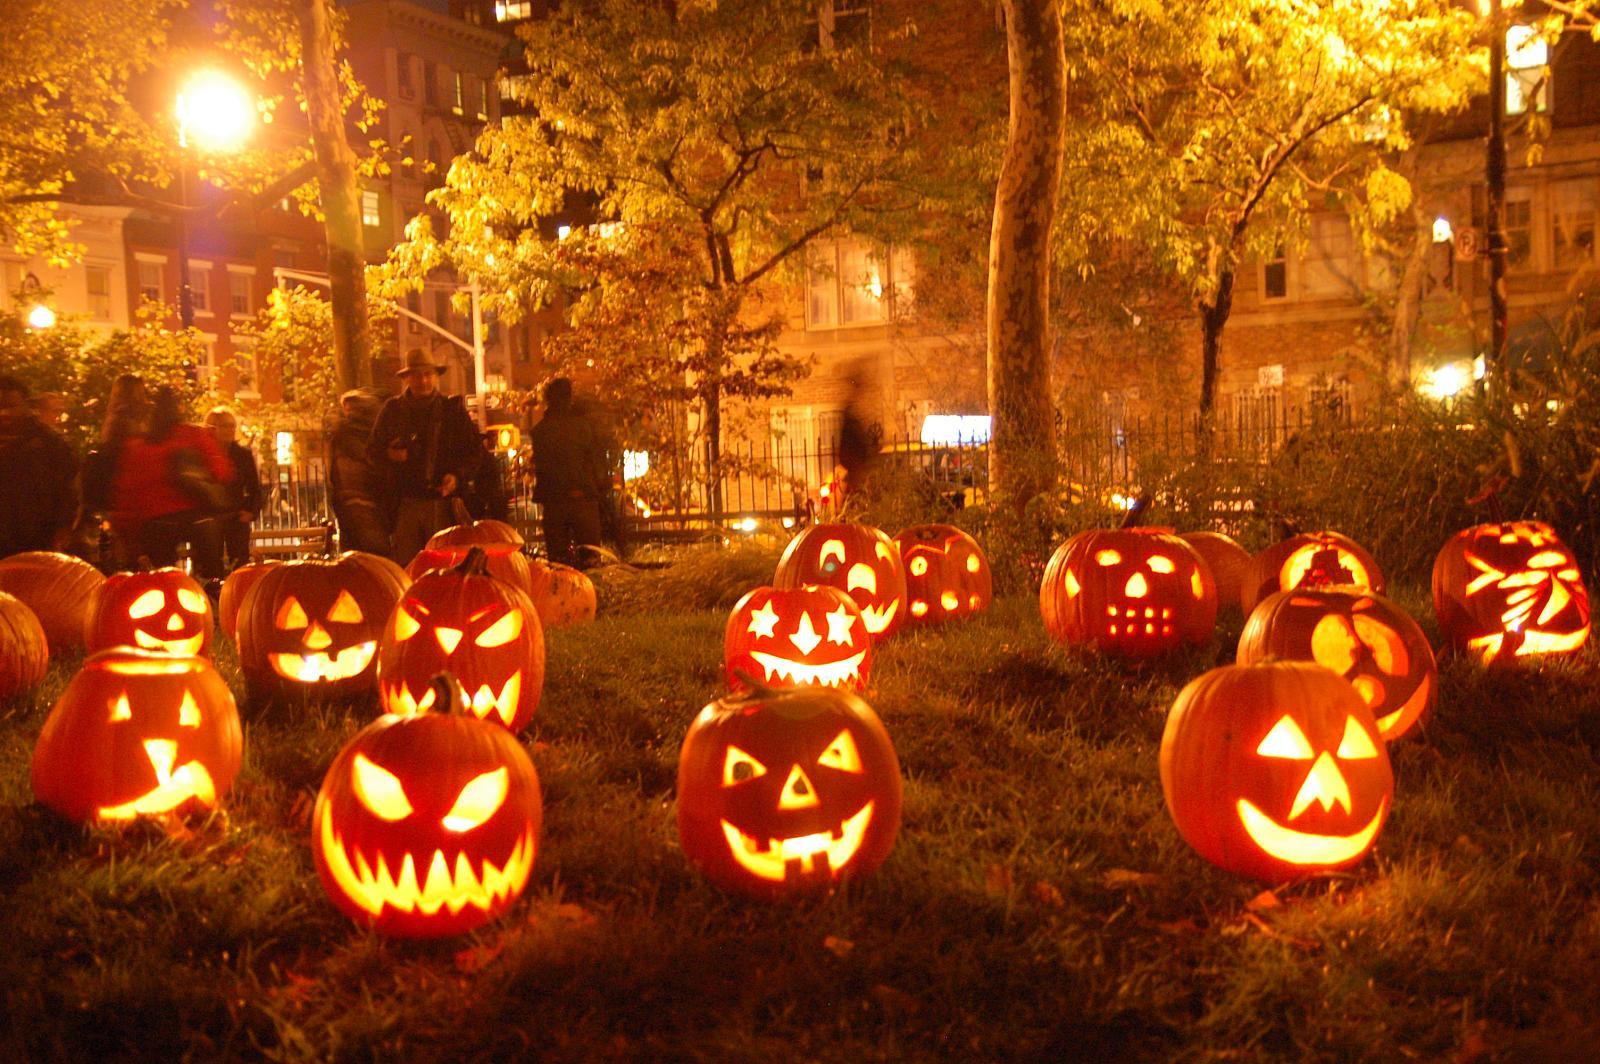 http://vedmochka.net/images/prazdniki/halloween-picture-tykvy.jpg